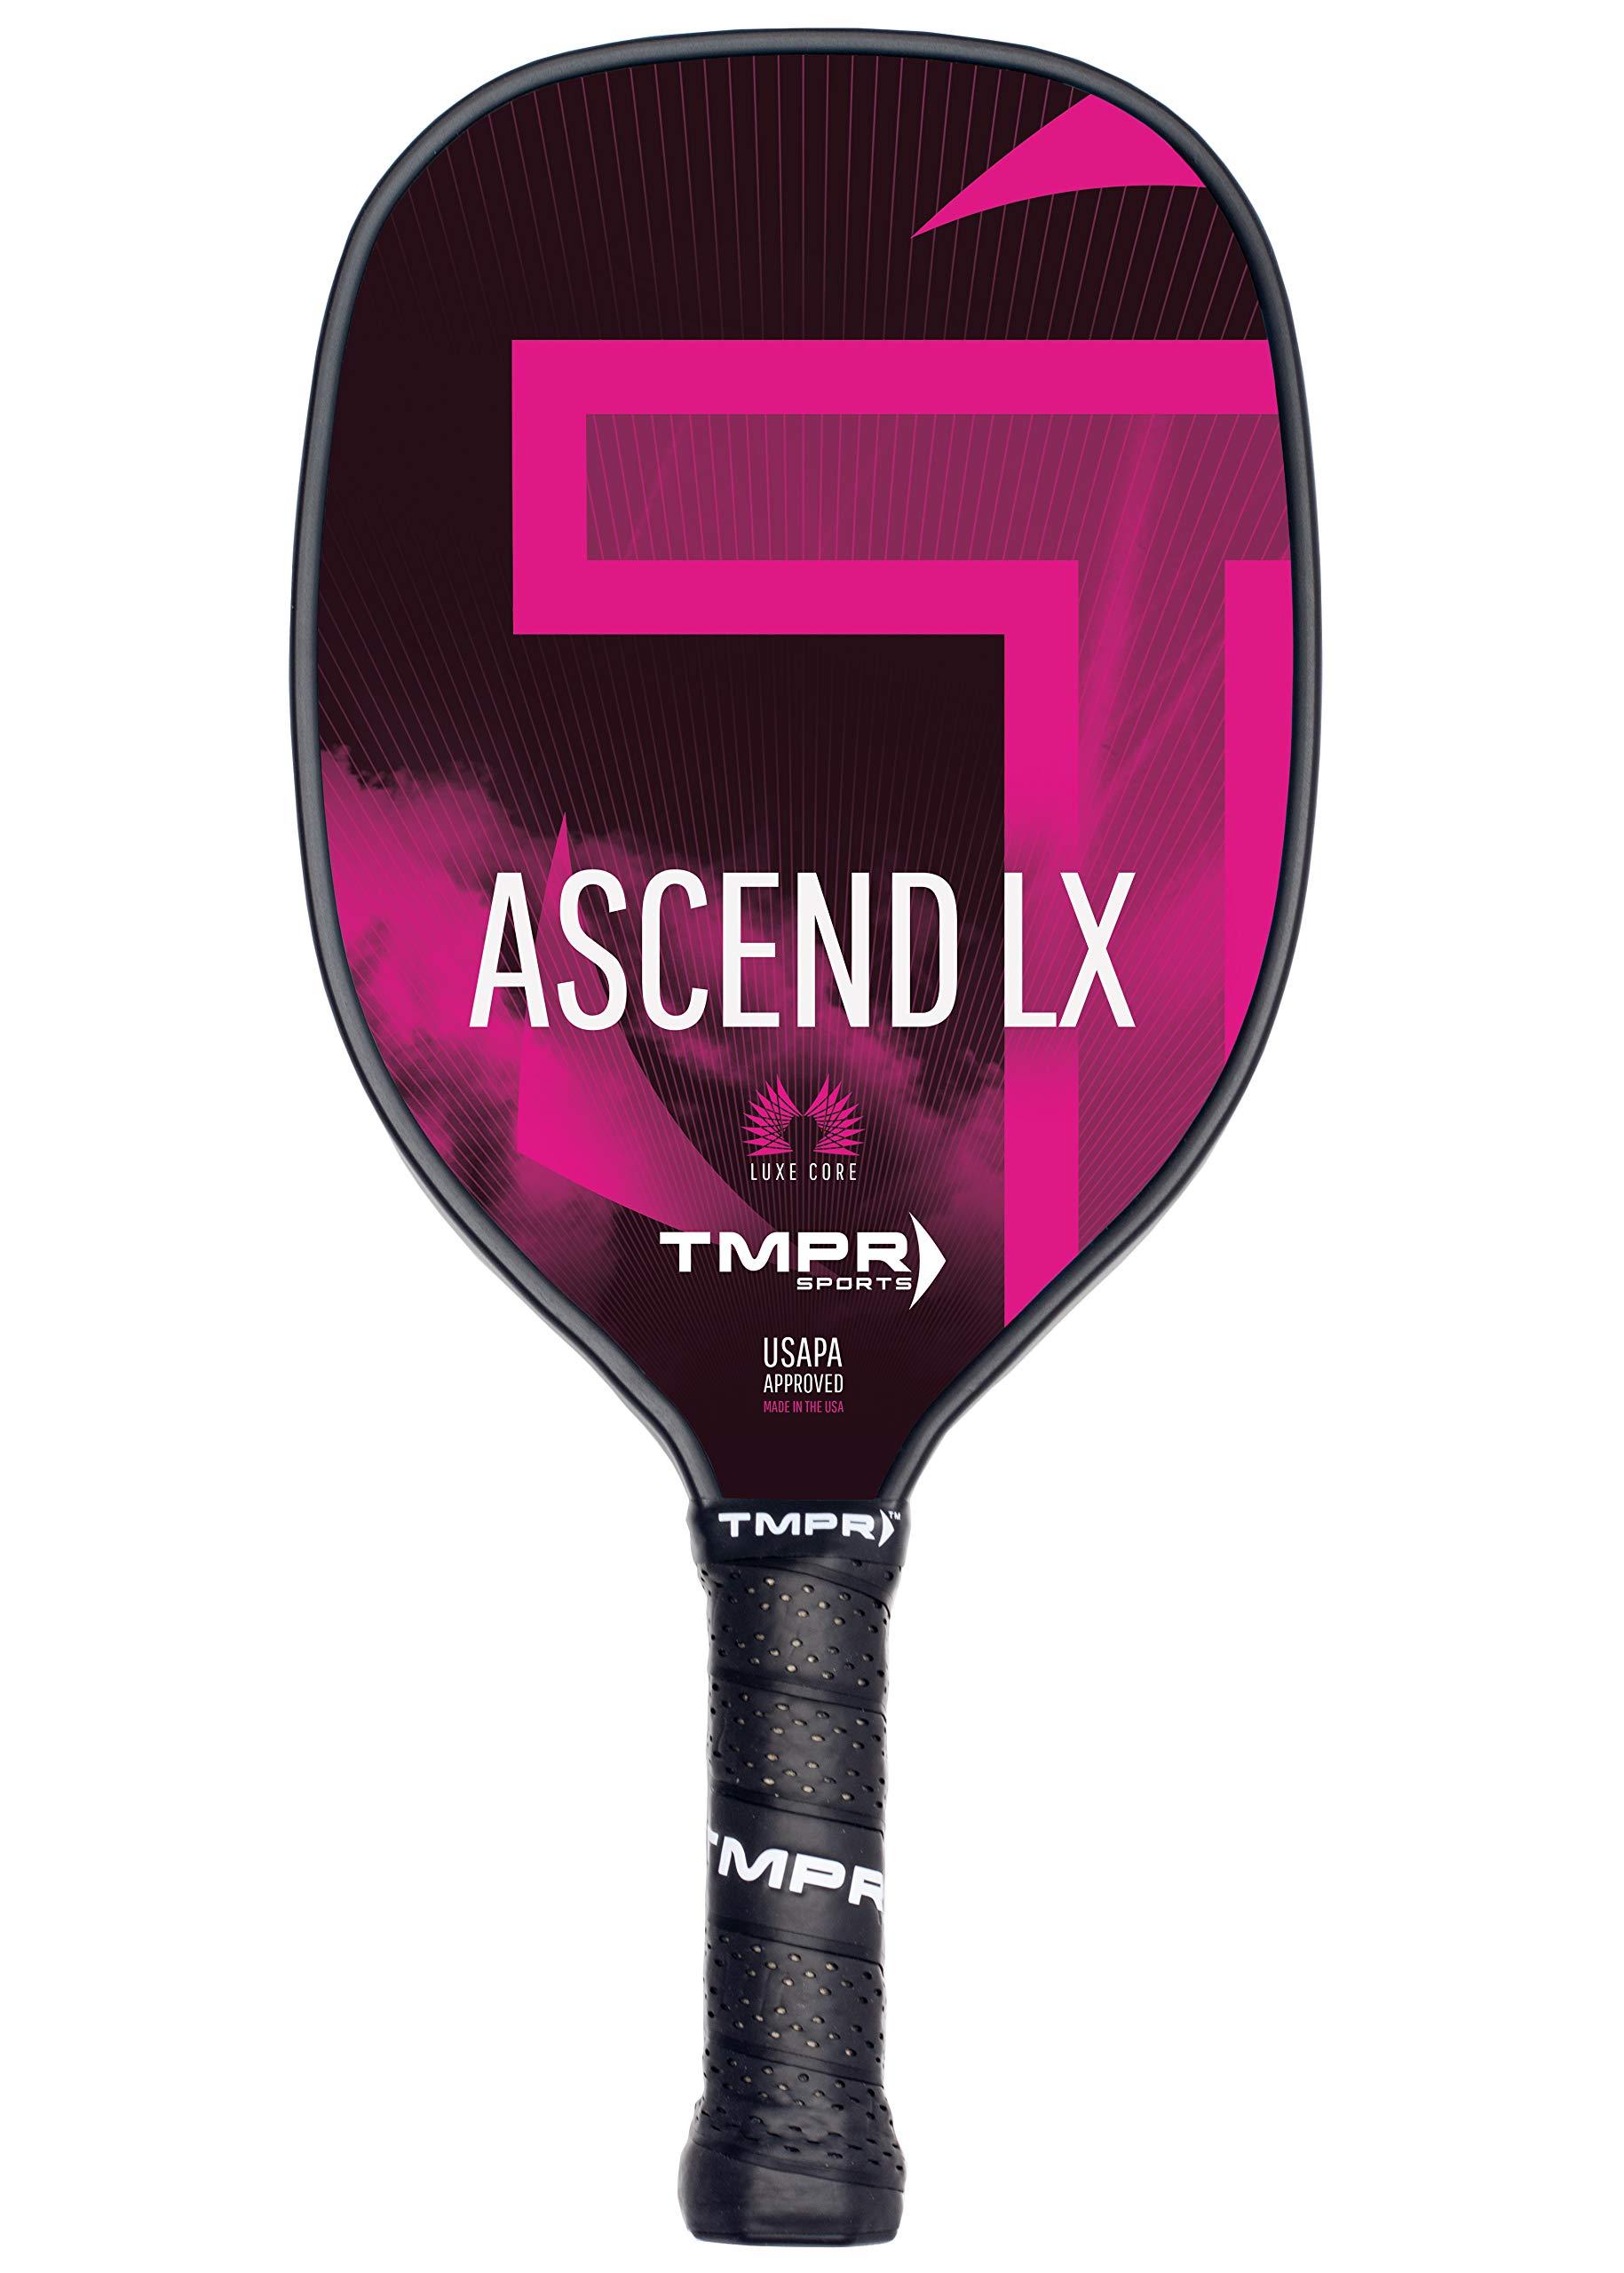 TMPR Sports > Ascend LX > Honeycomb Polymer Pickleball -CH3W